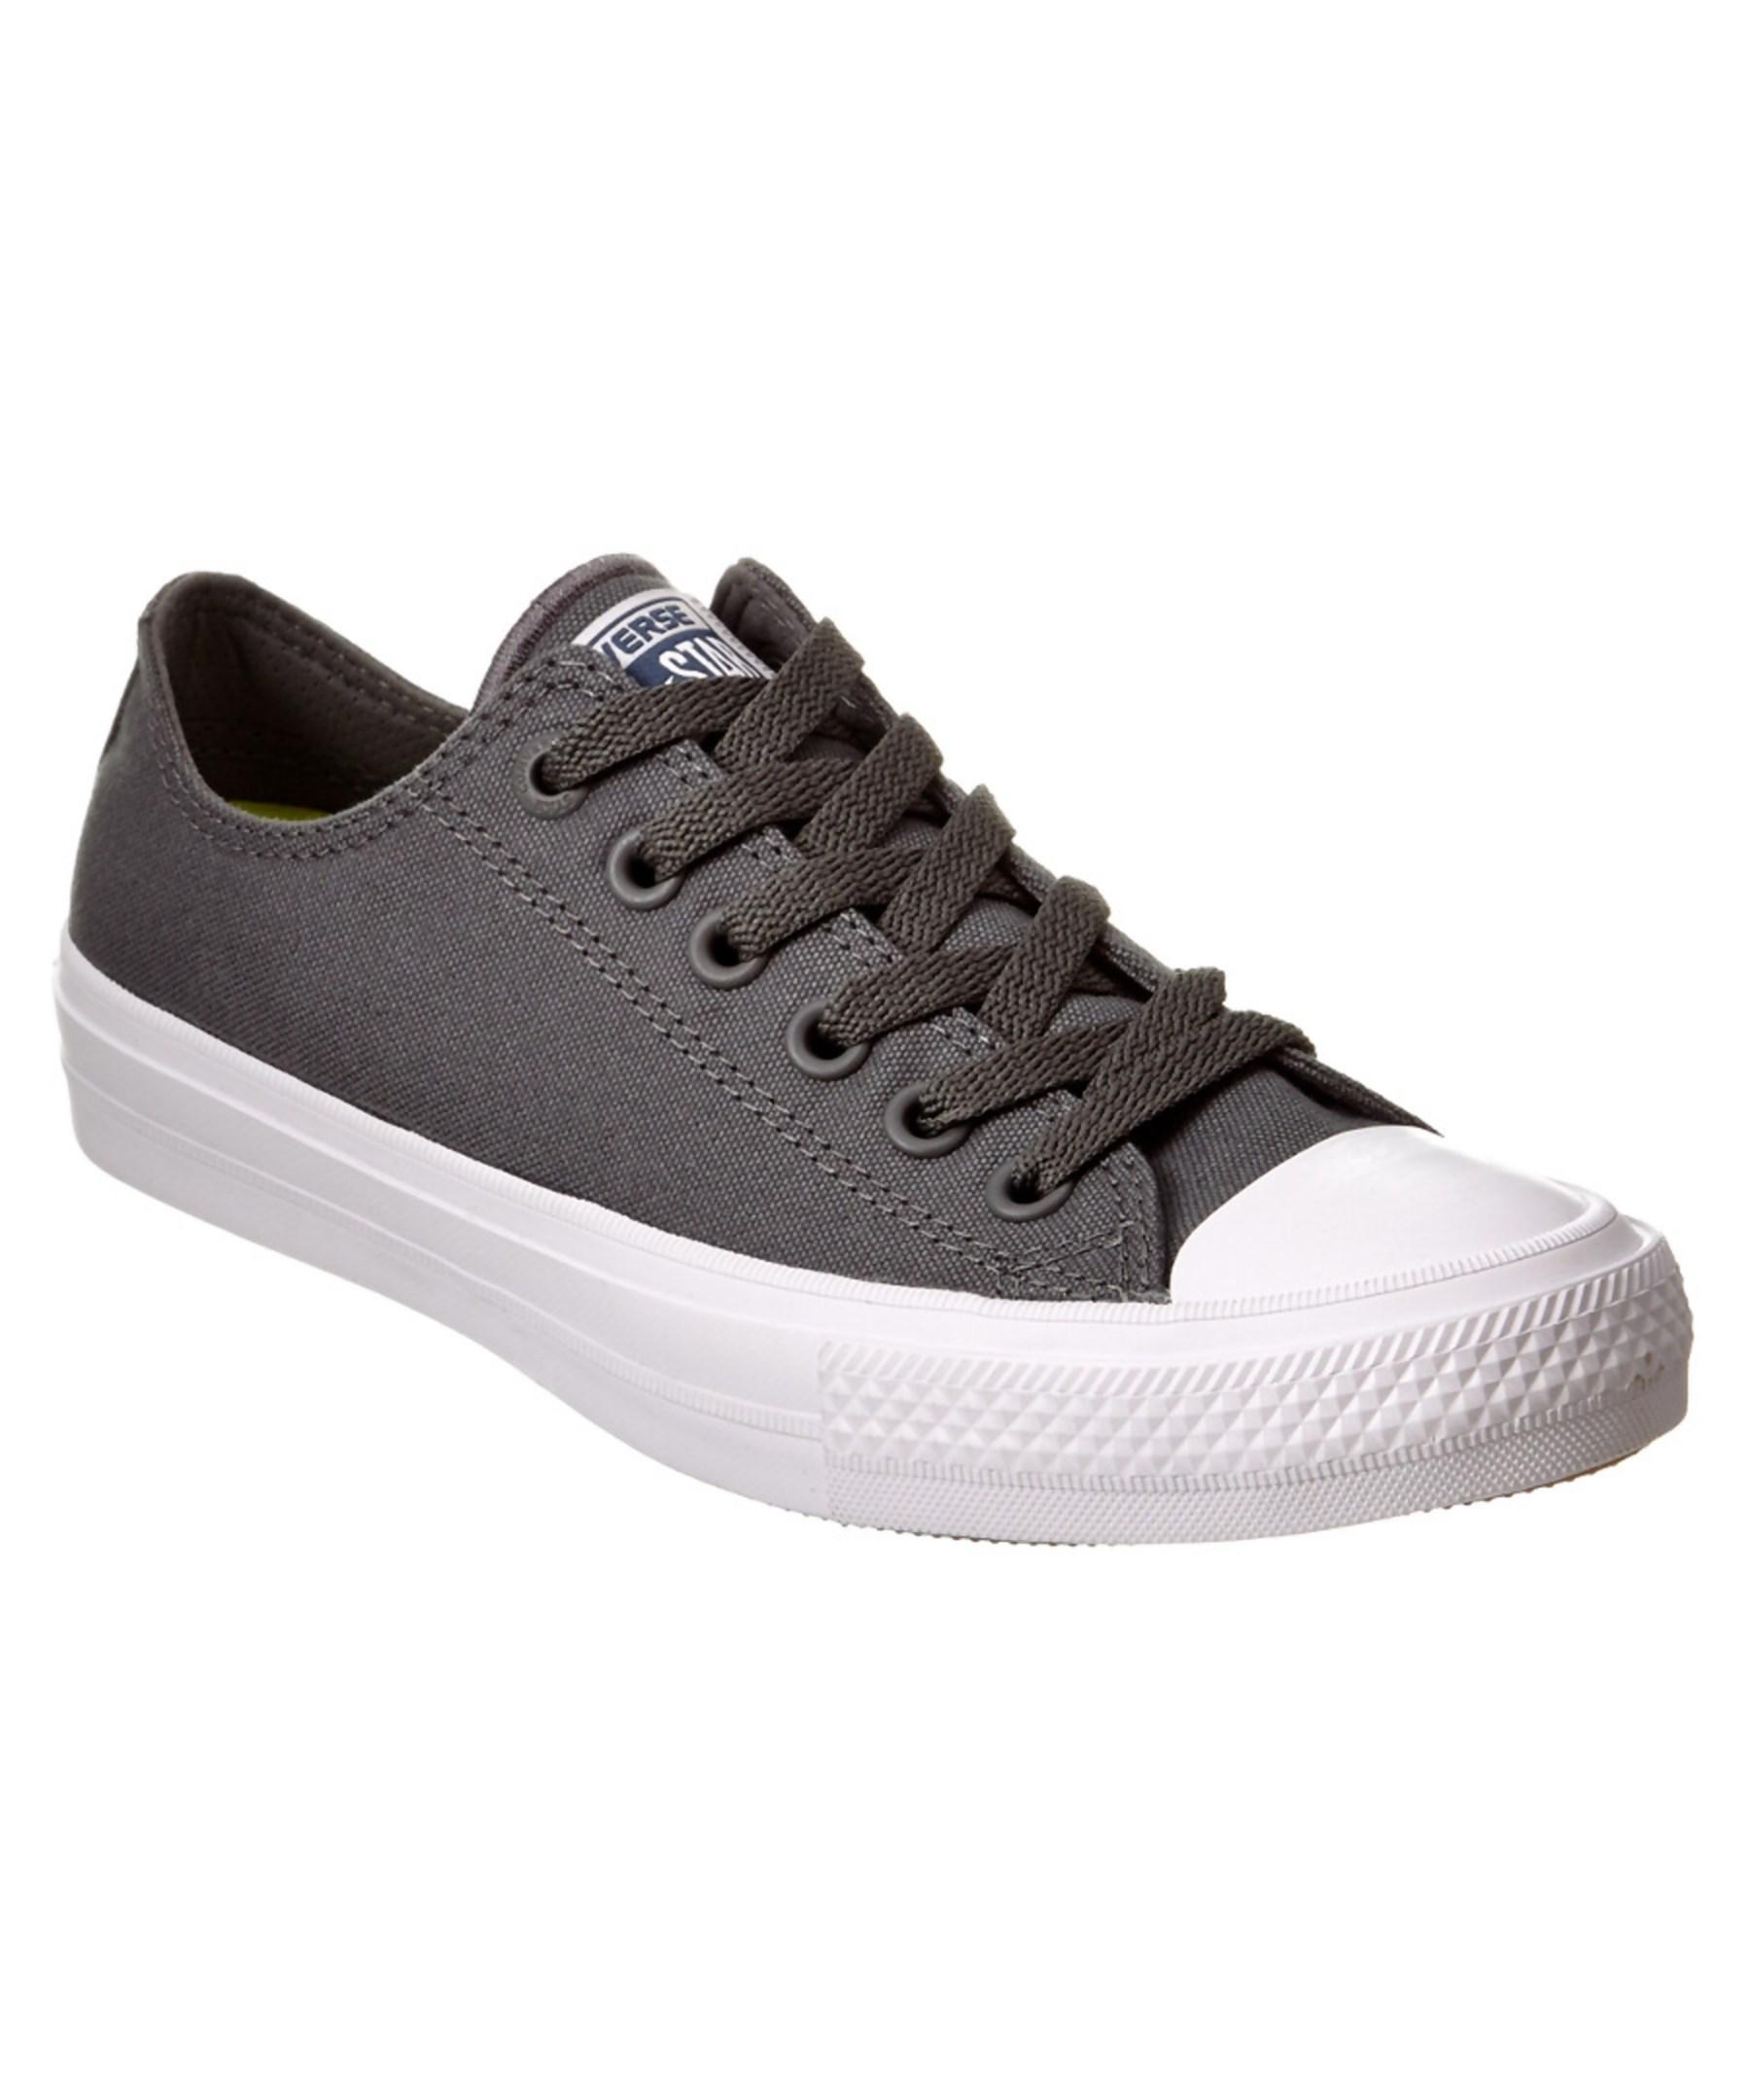 Lyst - Converse Unisex Chuck Taylor All Star Ii Sneaker in . af049f5ef8cf2